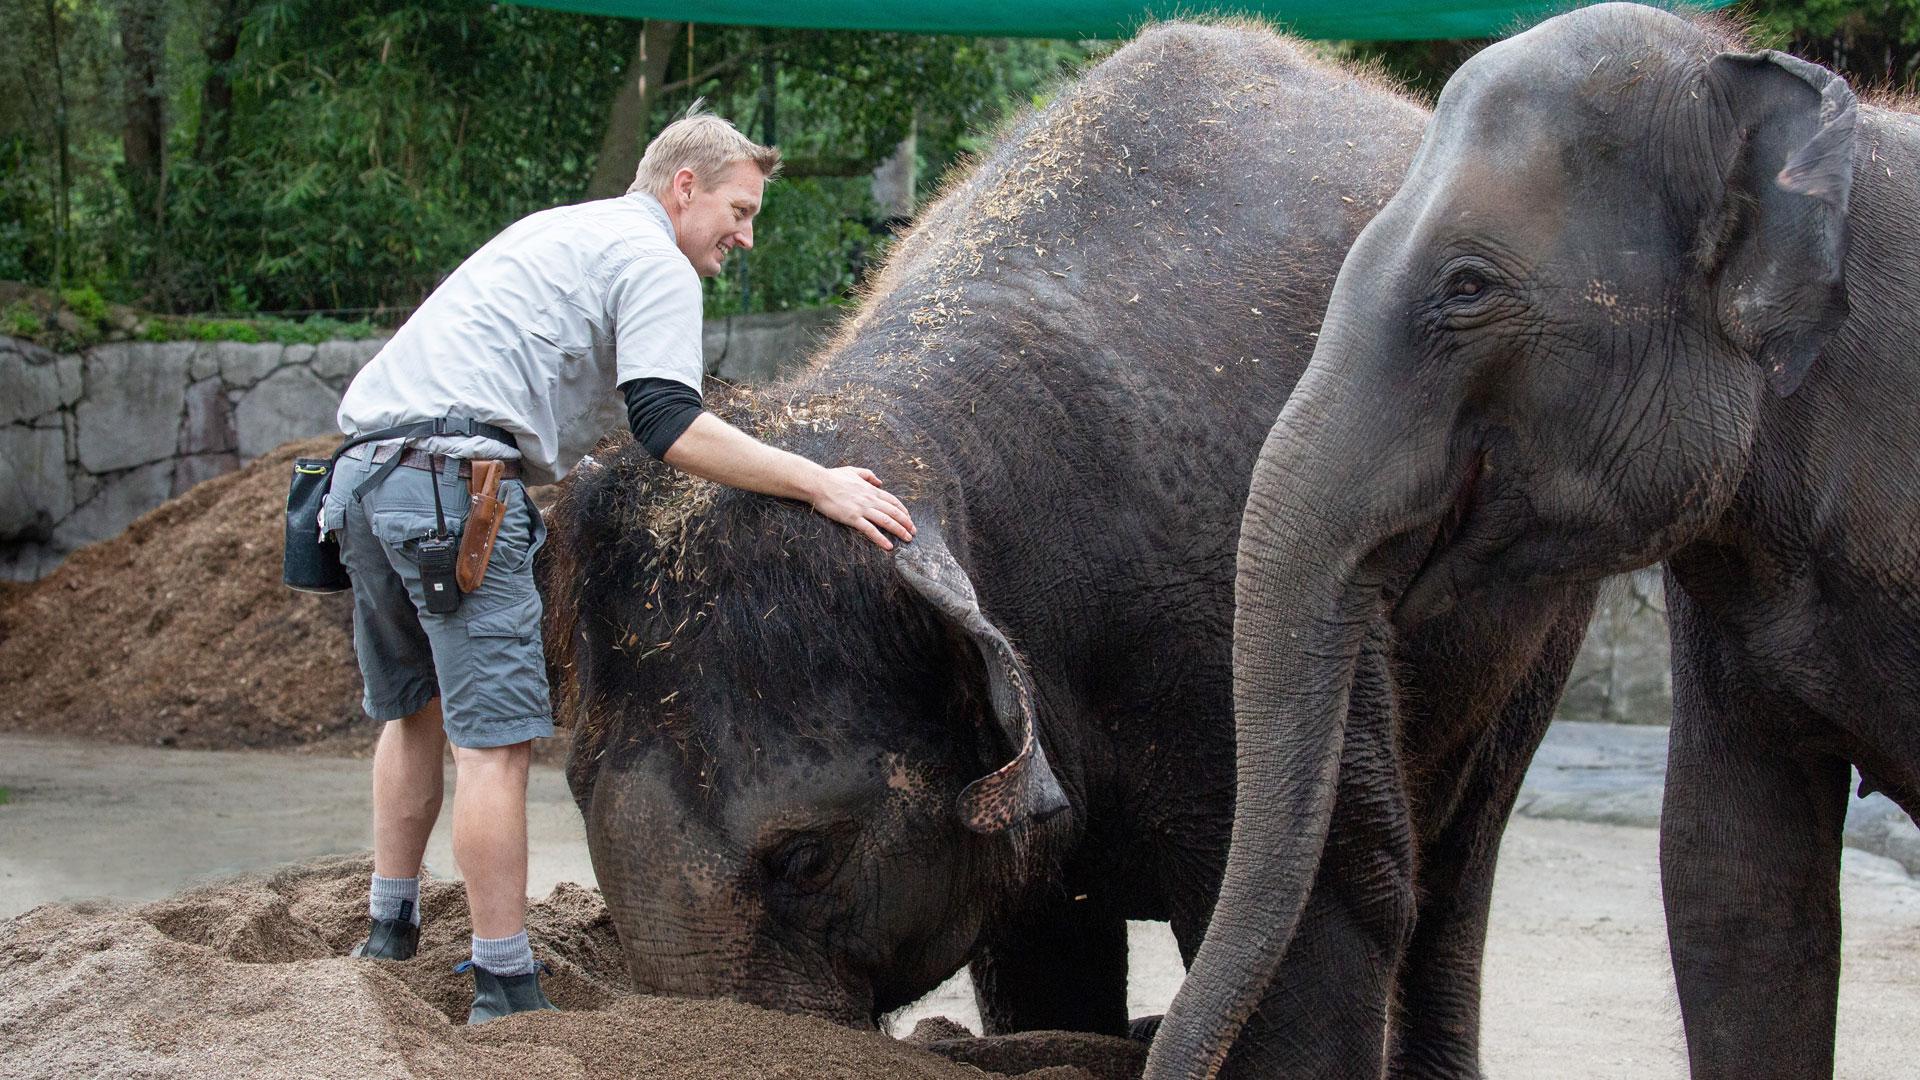 https://rfacdn.nz/zoo/assets/media/elephant-news-gallery-16.jpg